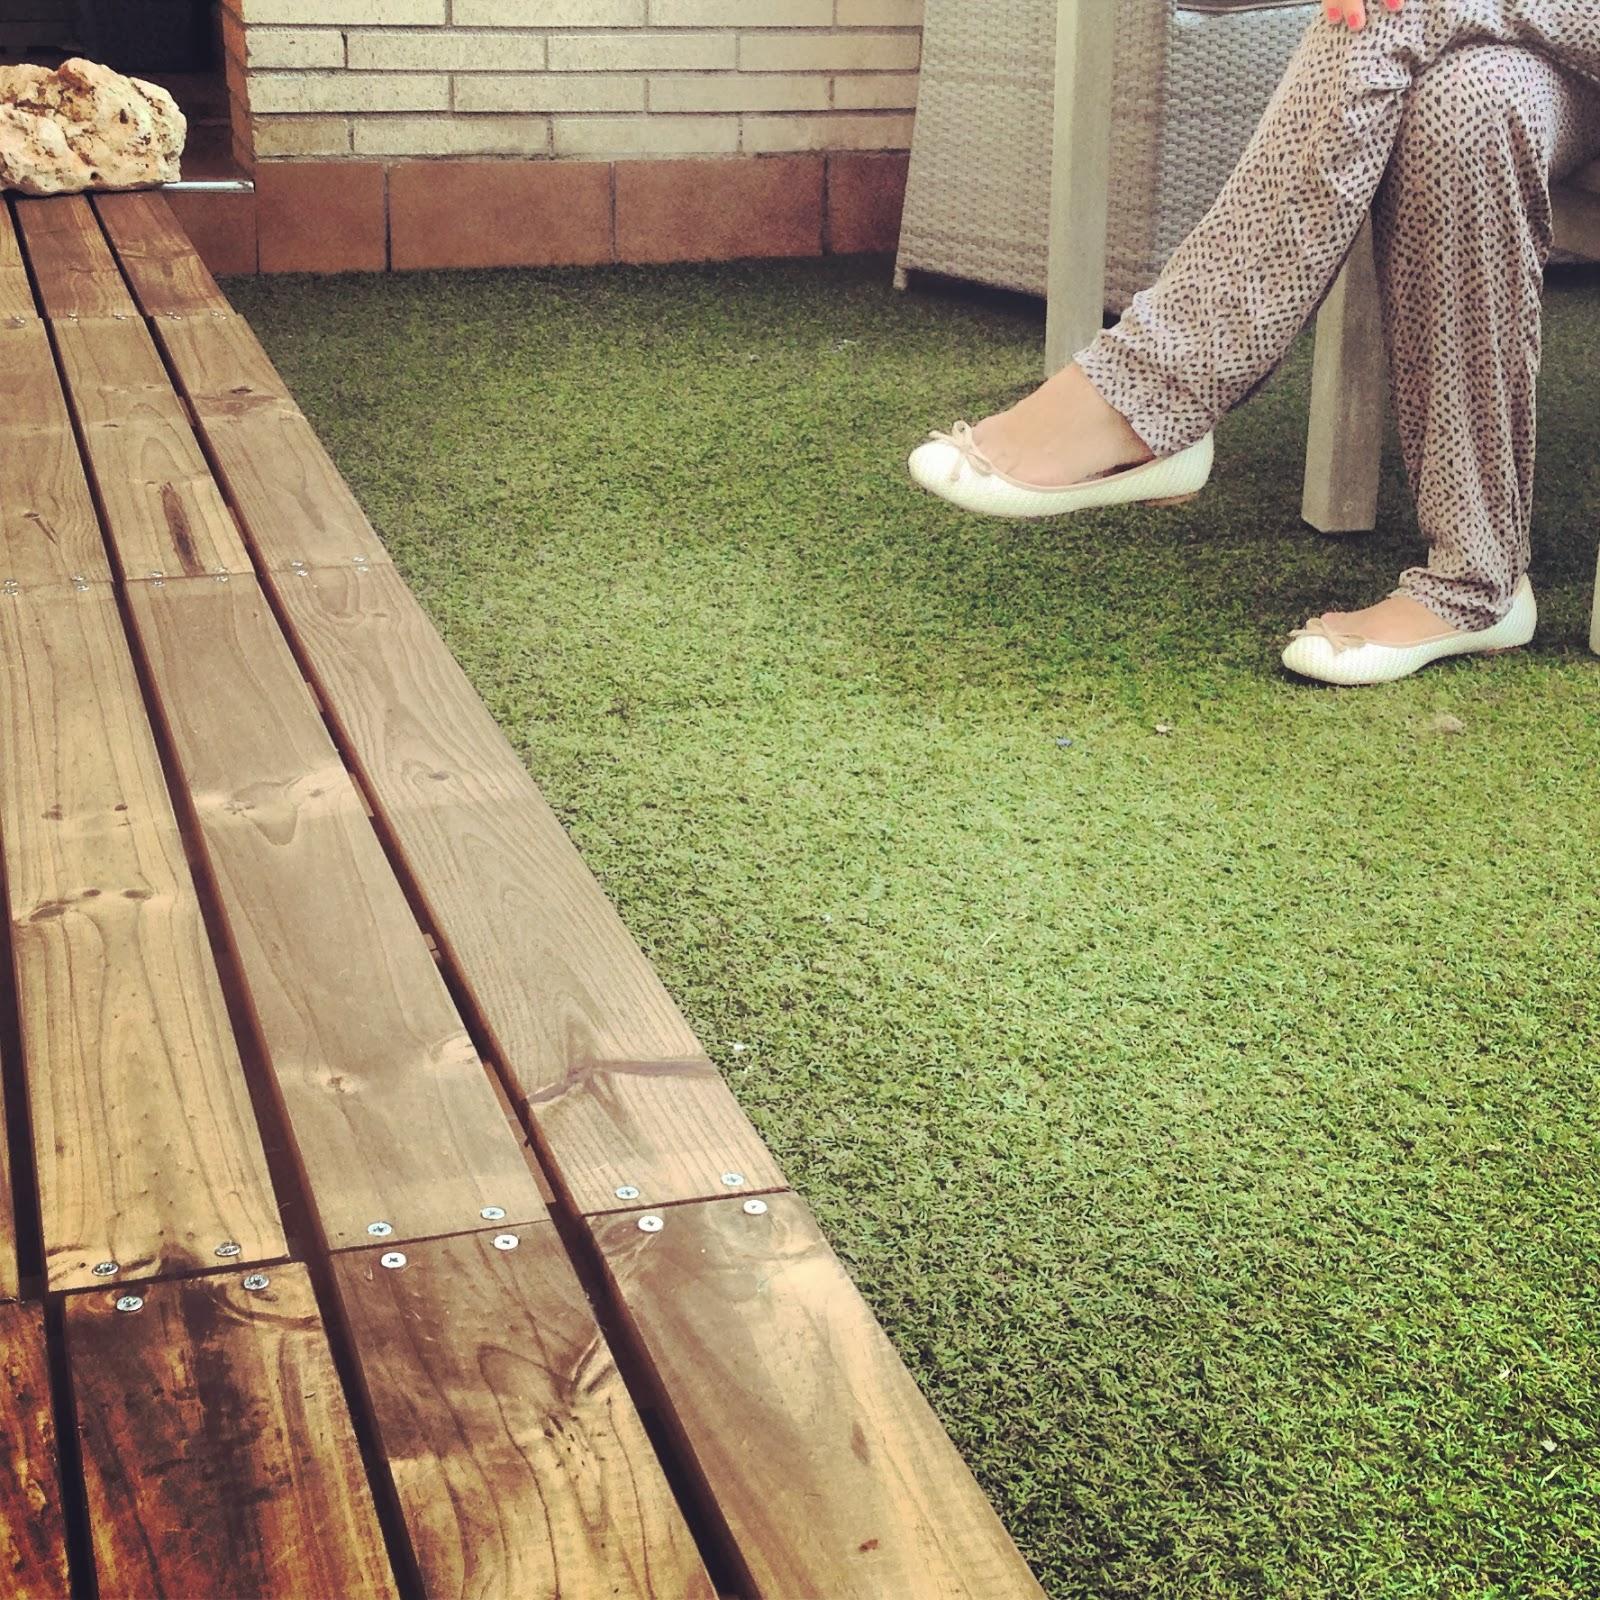 Realizaci n de una tarima de madera para terraza rojosill n - Tarima para terraza ...